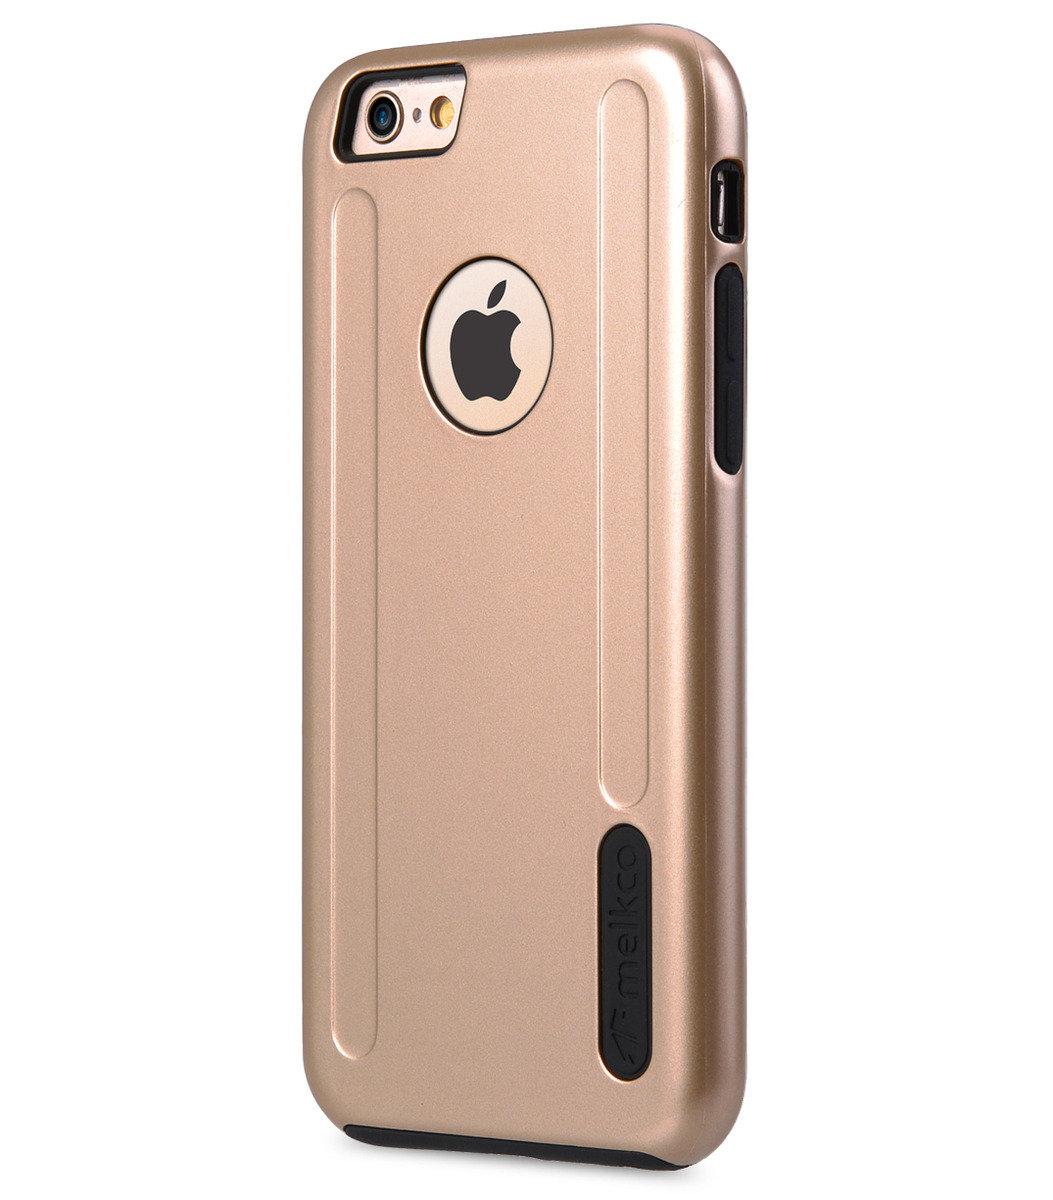 "Apple iPhone 6s (4.7"") Special Edition Metallic Kubalt 雙層保護殼(可見蘋果標誌)- 金色/黑色"